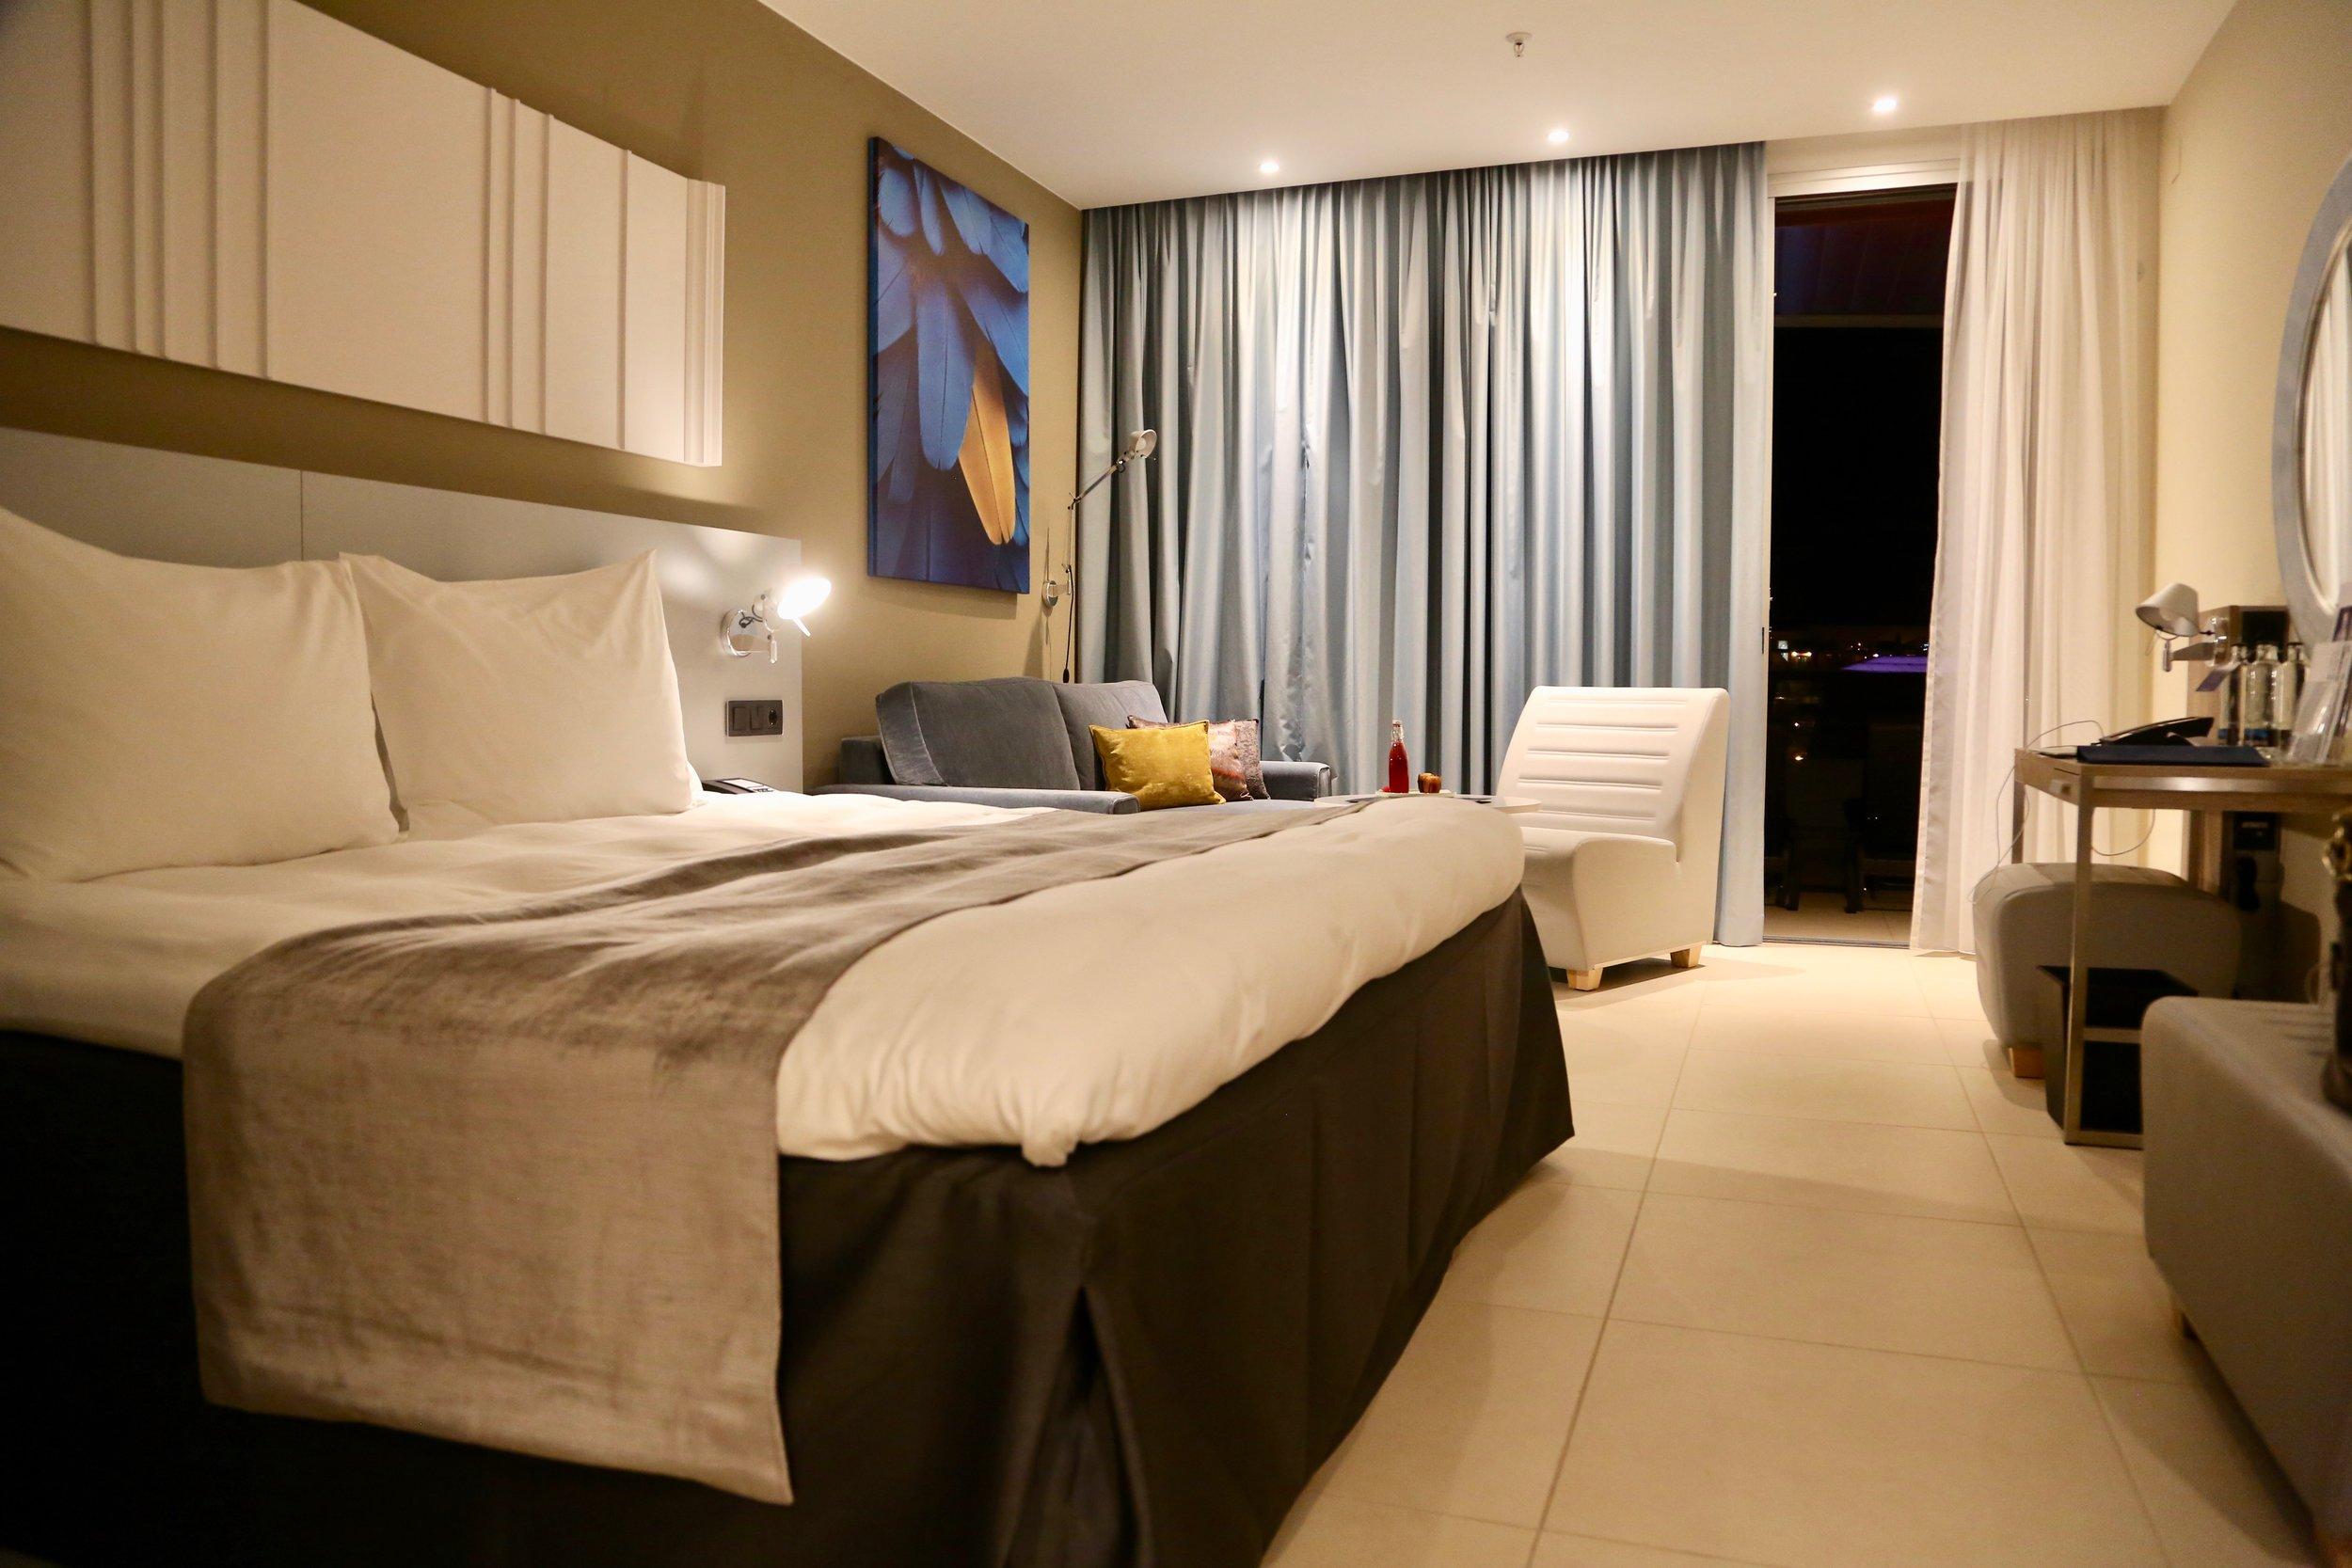 hotellrom-thetravelinspector